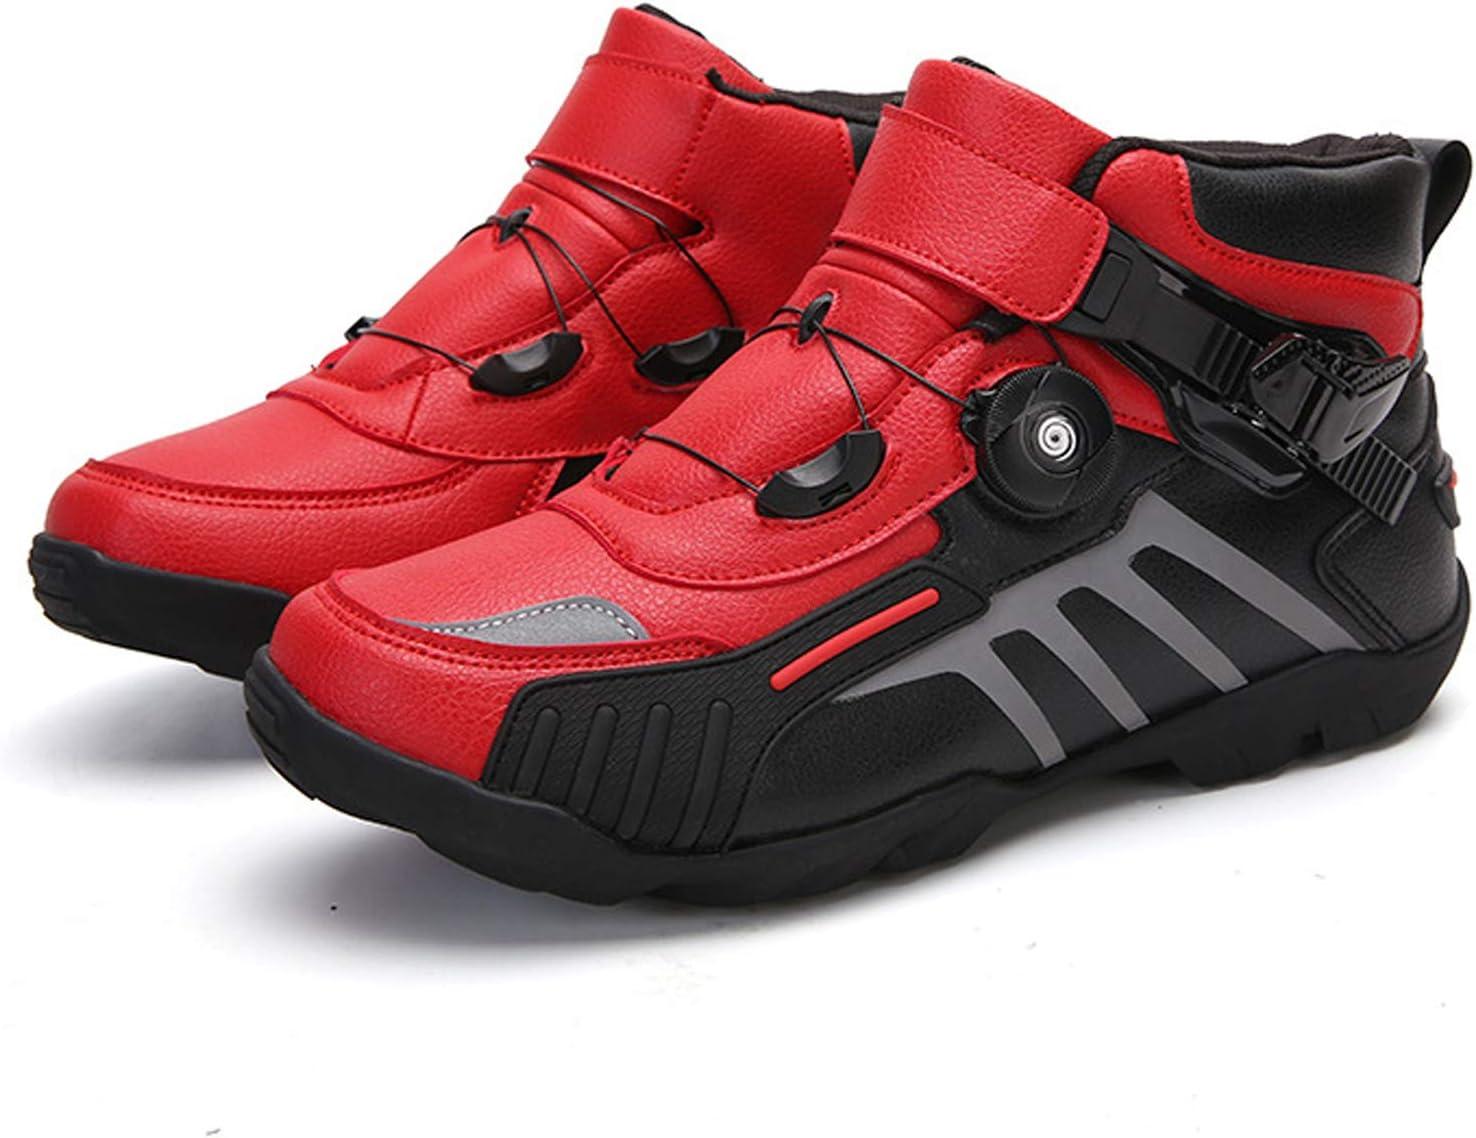 Motorradschuhe Herren Damen Motorrad Stiefel Rot Schwarz Motorrad Schuhe Sneaker Atmungsaktives Turnschuhe Enduro Racing Sport Gepanzert MRDEAR Motocross Kurze Ankle Stiefel mit Einstellknopf